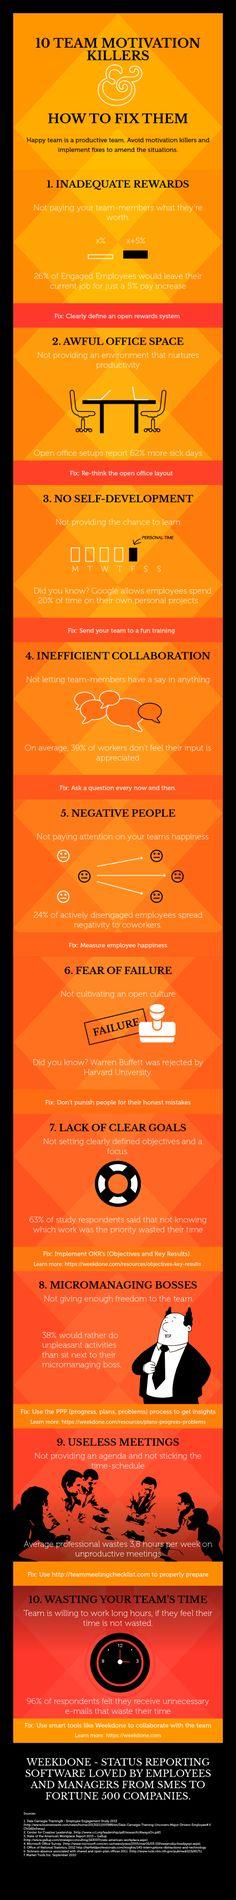 10 Team Motivation Killers & How to Fix Them [Infographic, Employee Motivation, Satisfaction] #NerdMentor